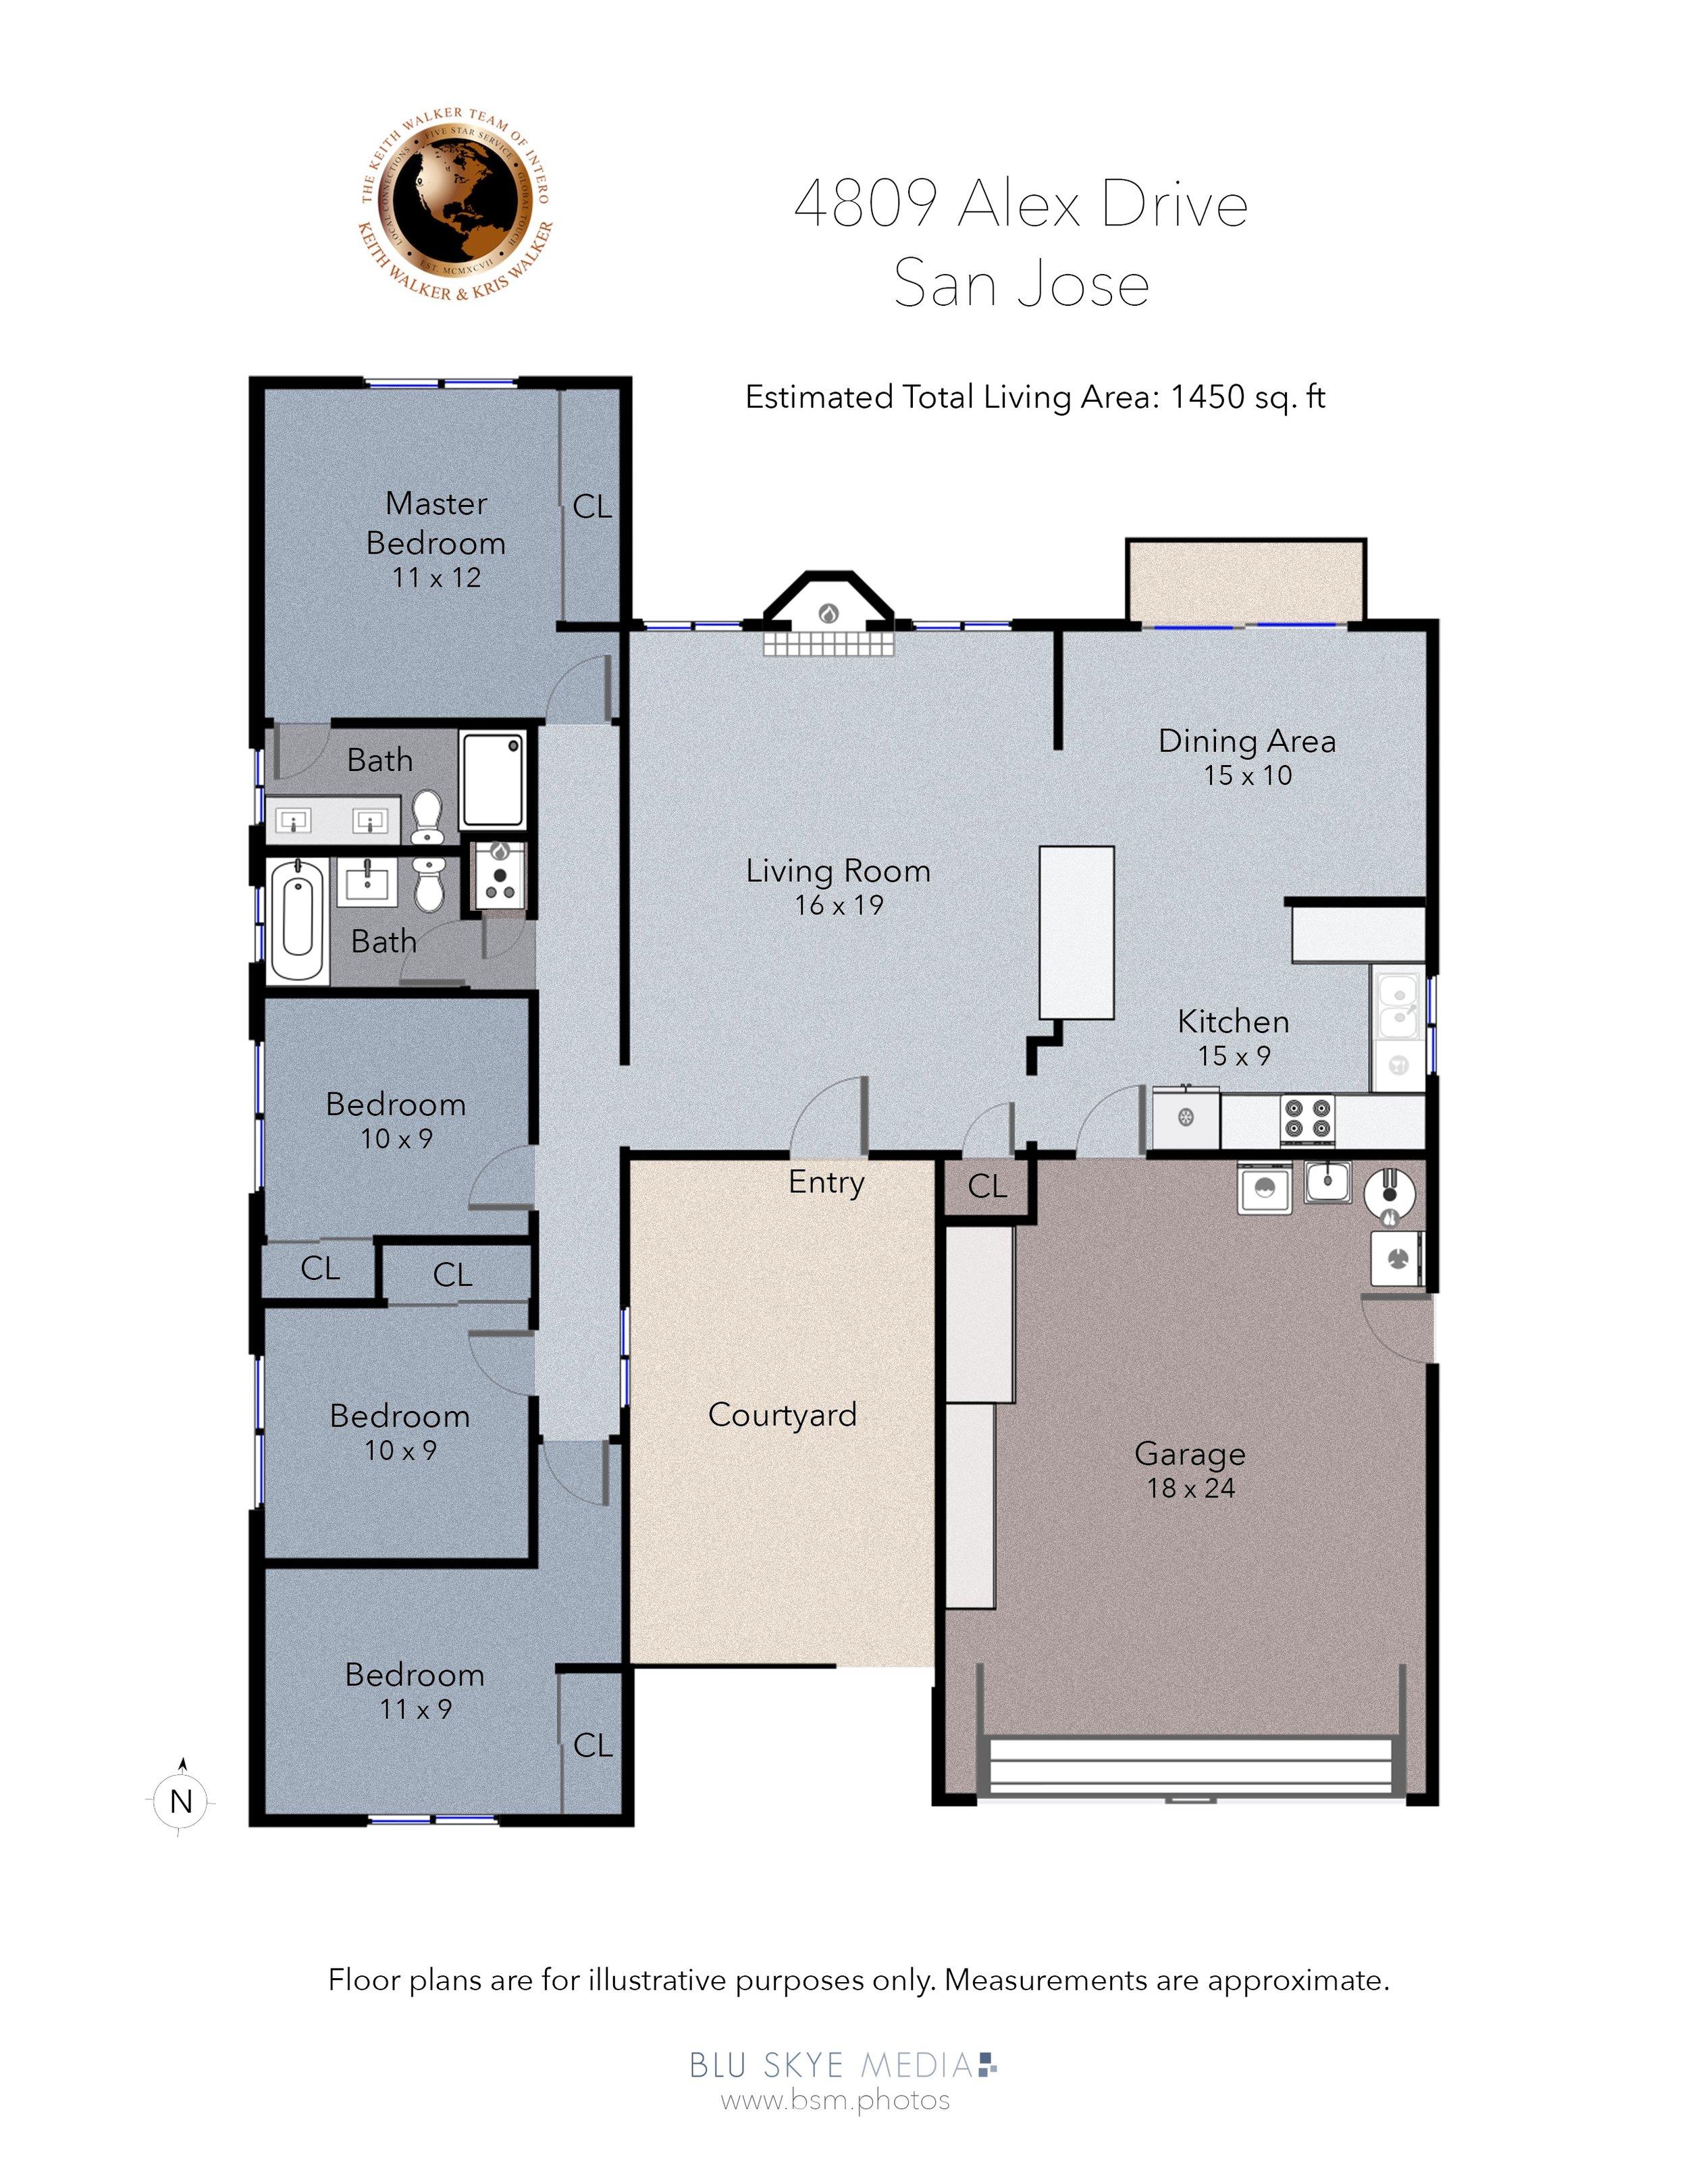 4809 Alex Drive, San Jose Floor plan.jpg